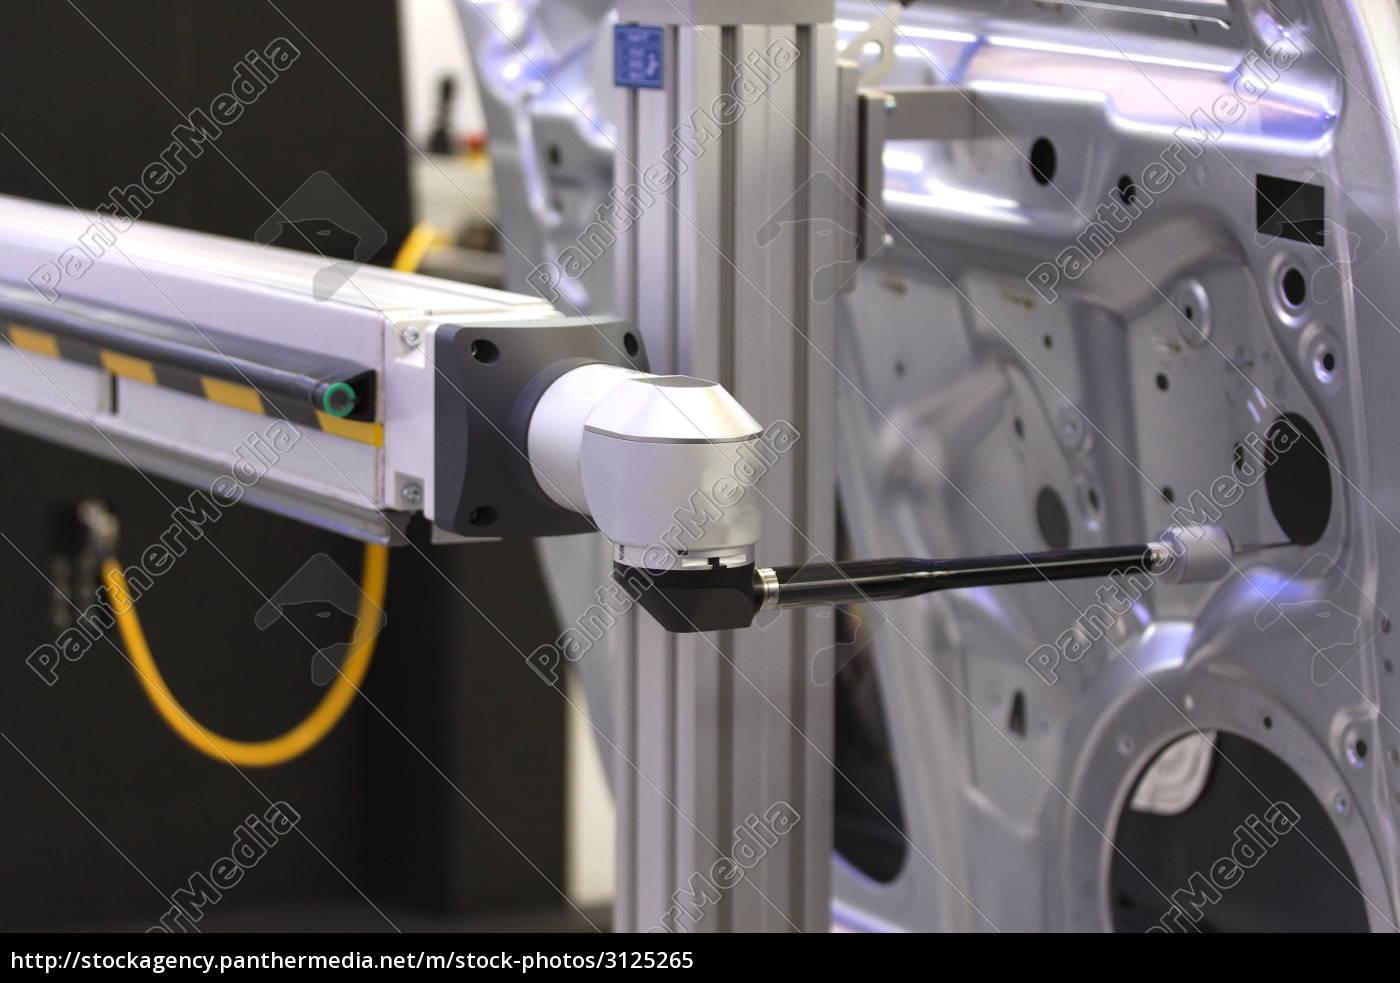 button, of, the, measuring, robot - 3125265